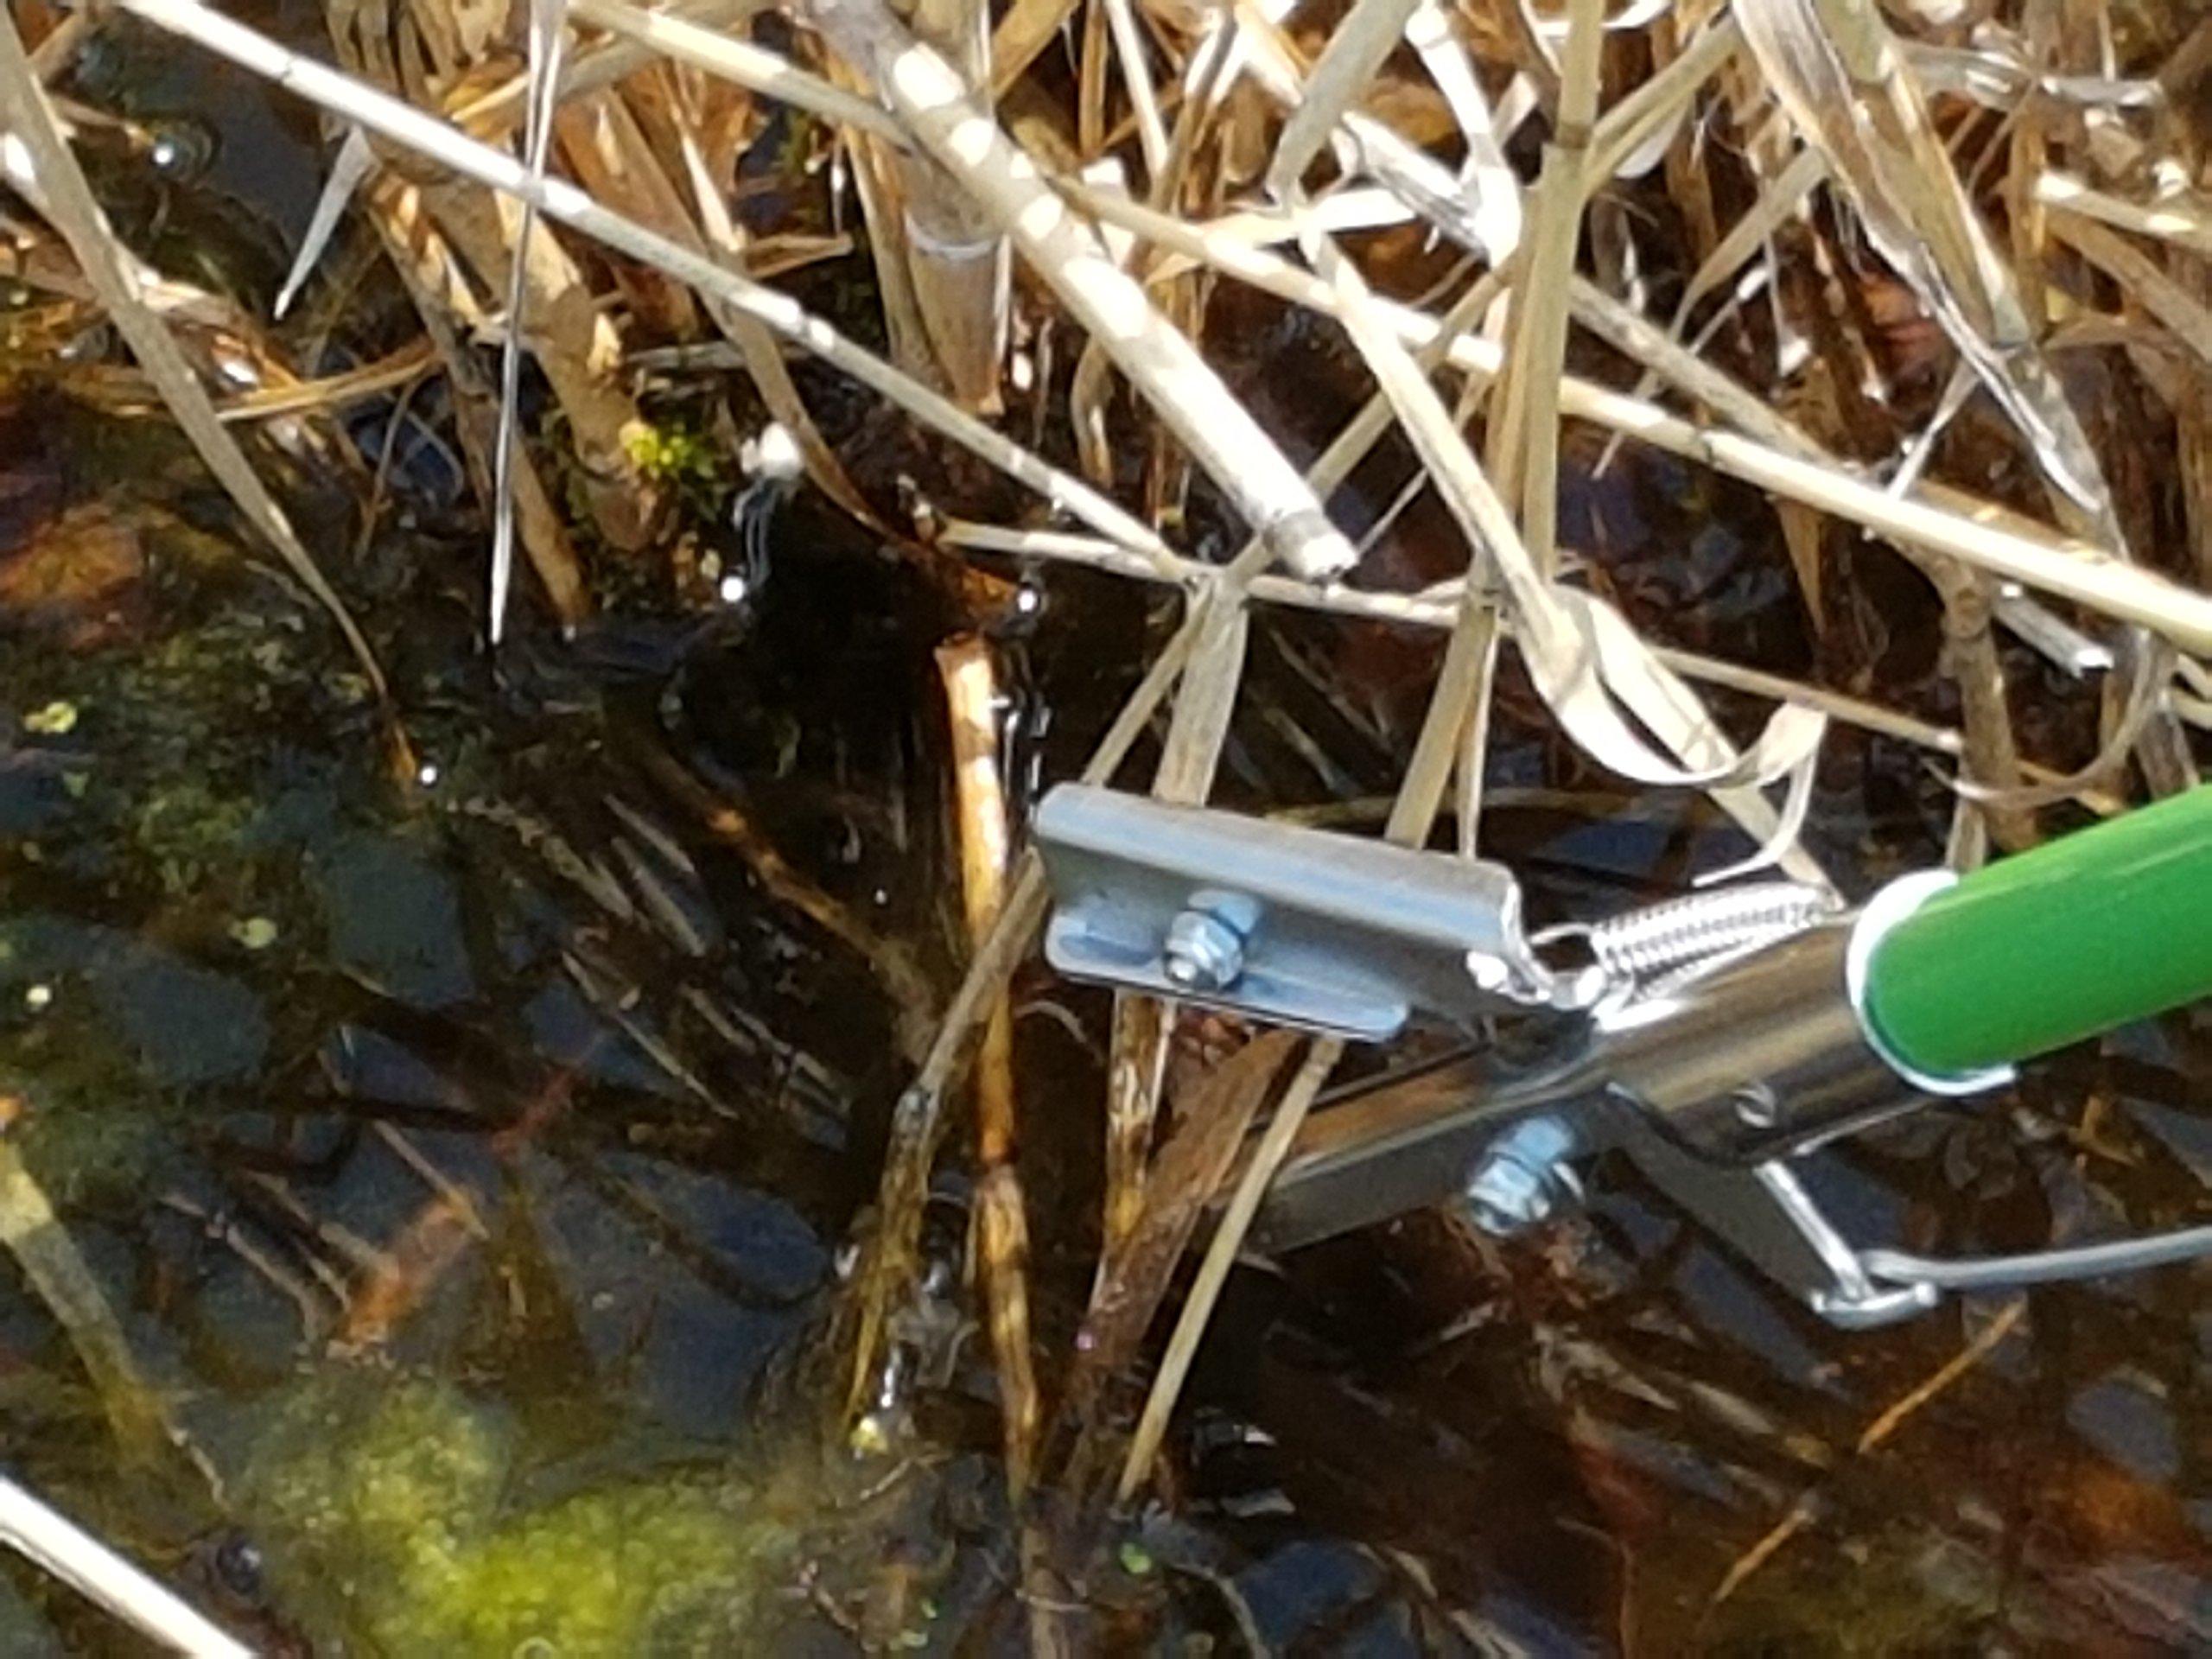 Pond Scissors